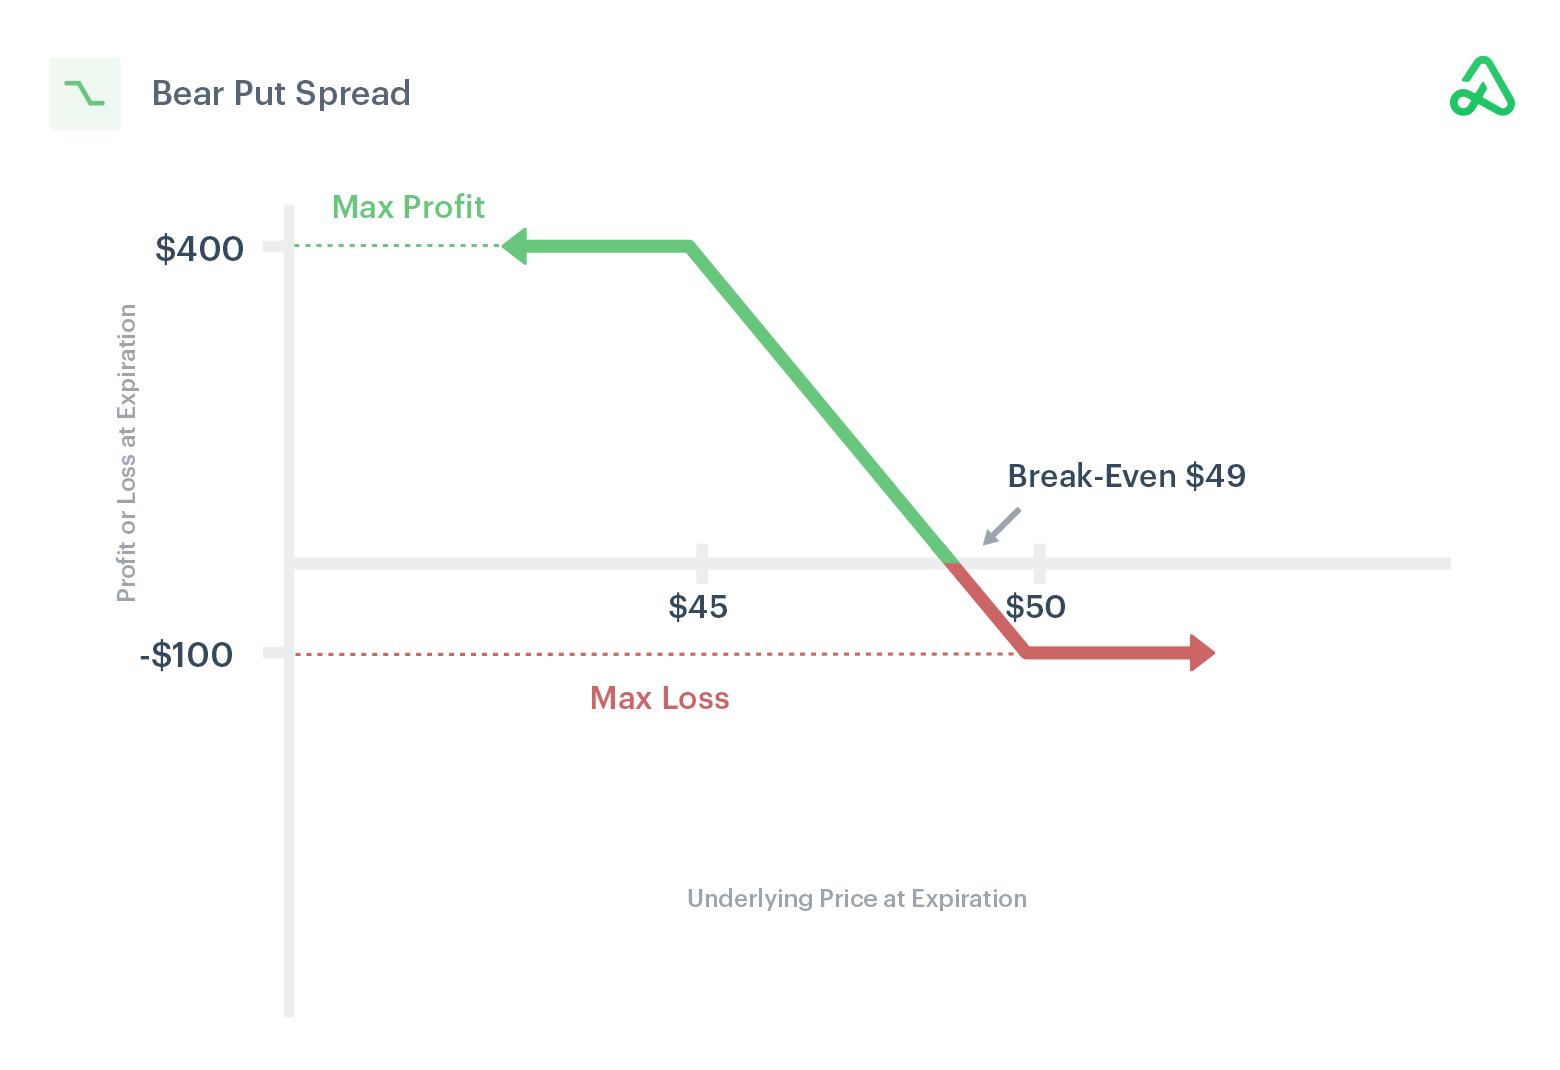 Bear put debit spread payoff diagram